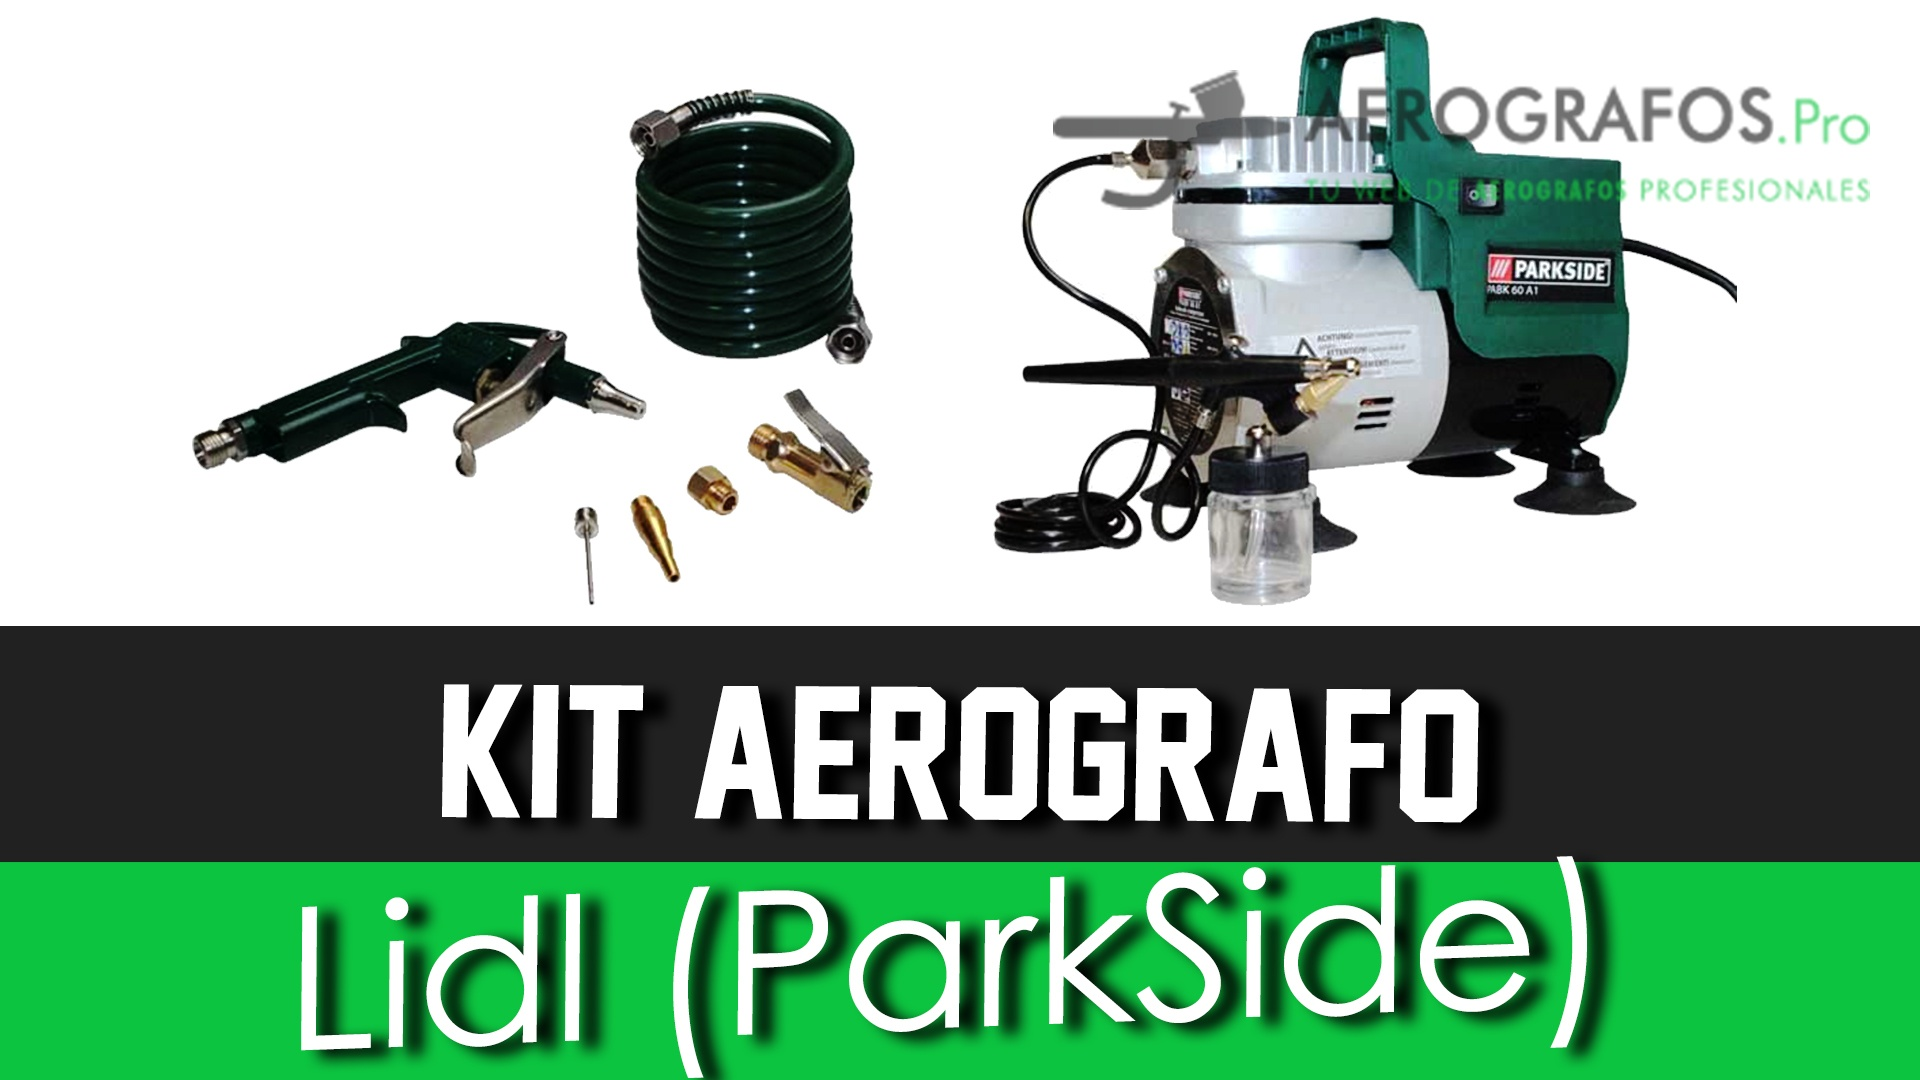 Aerografo Lidl (Parkside)